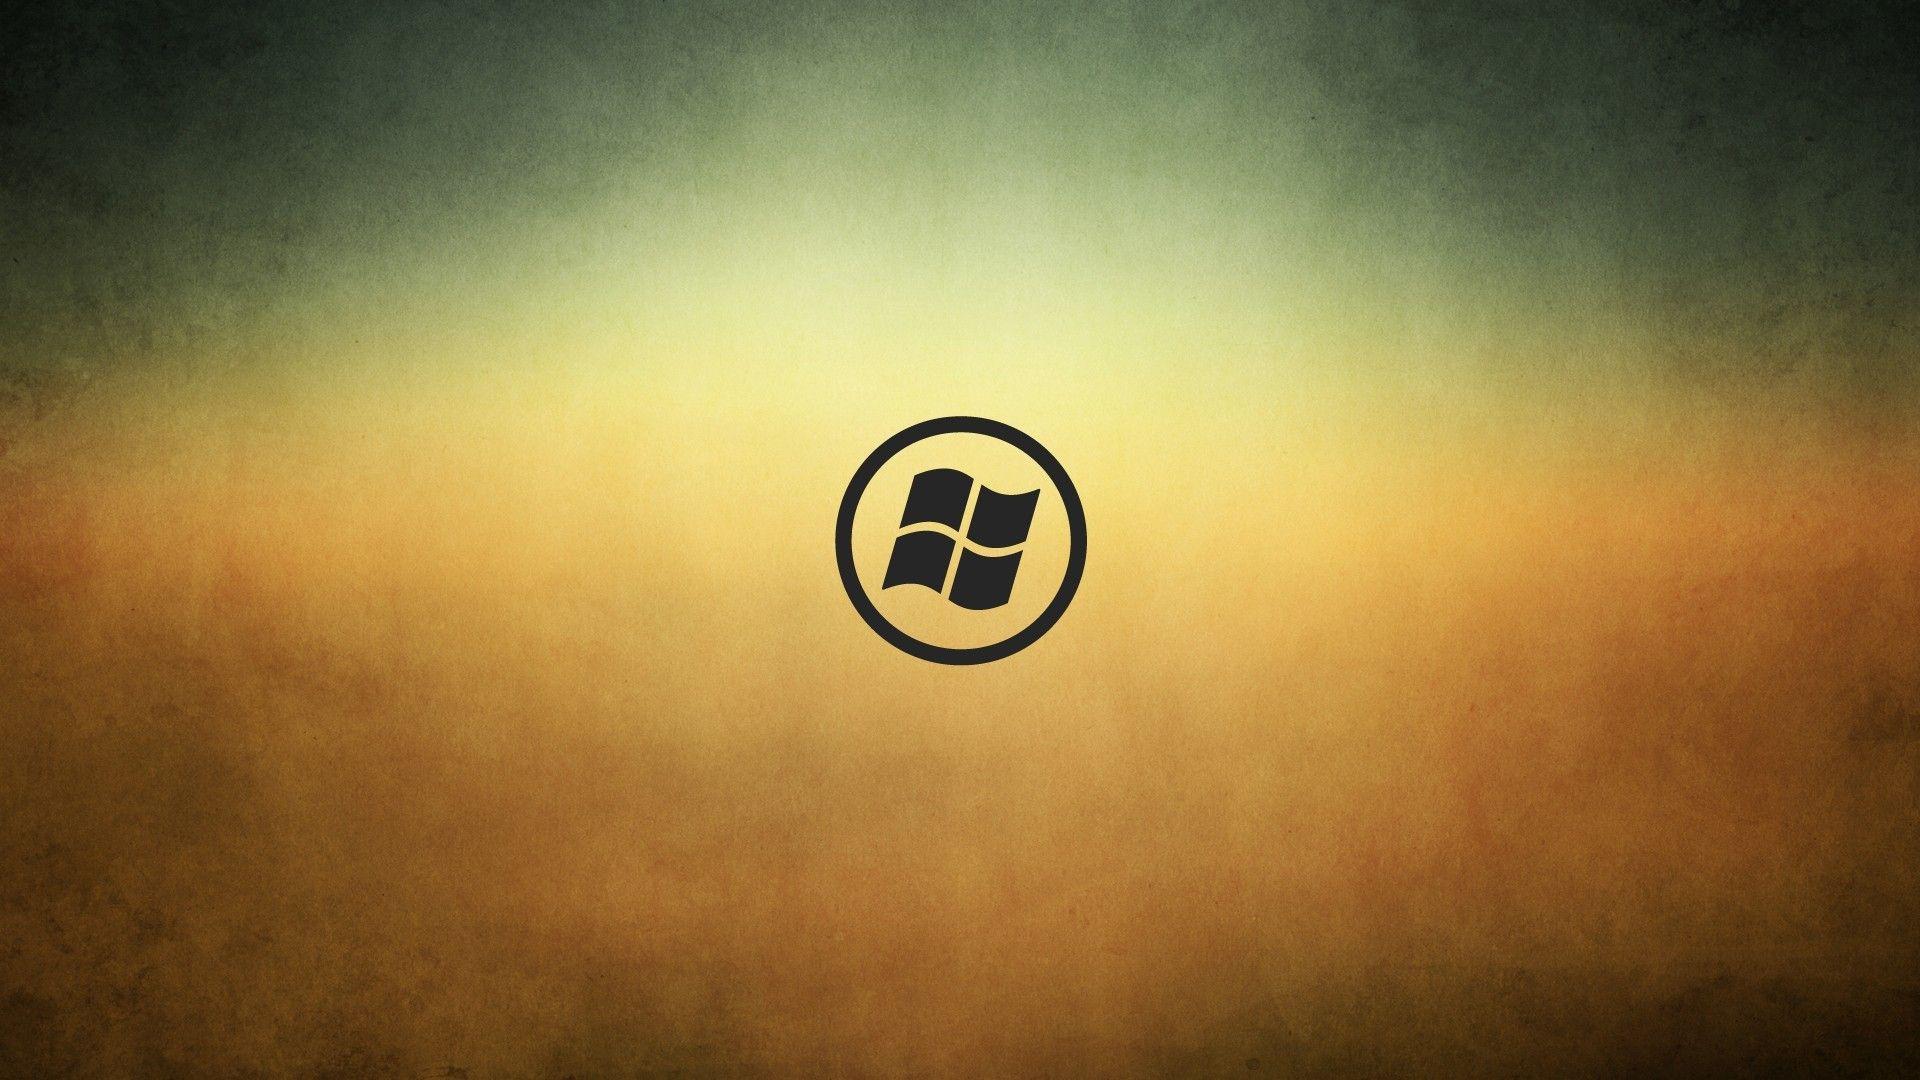 Microsoft Windows logos Windows wallpaper, Desktop